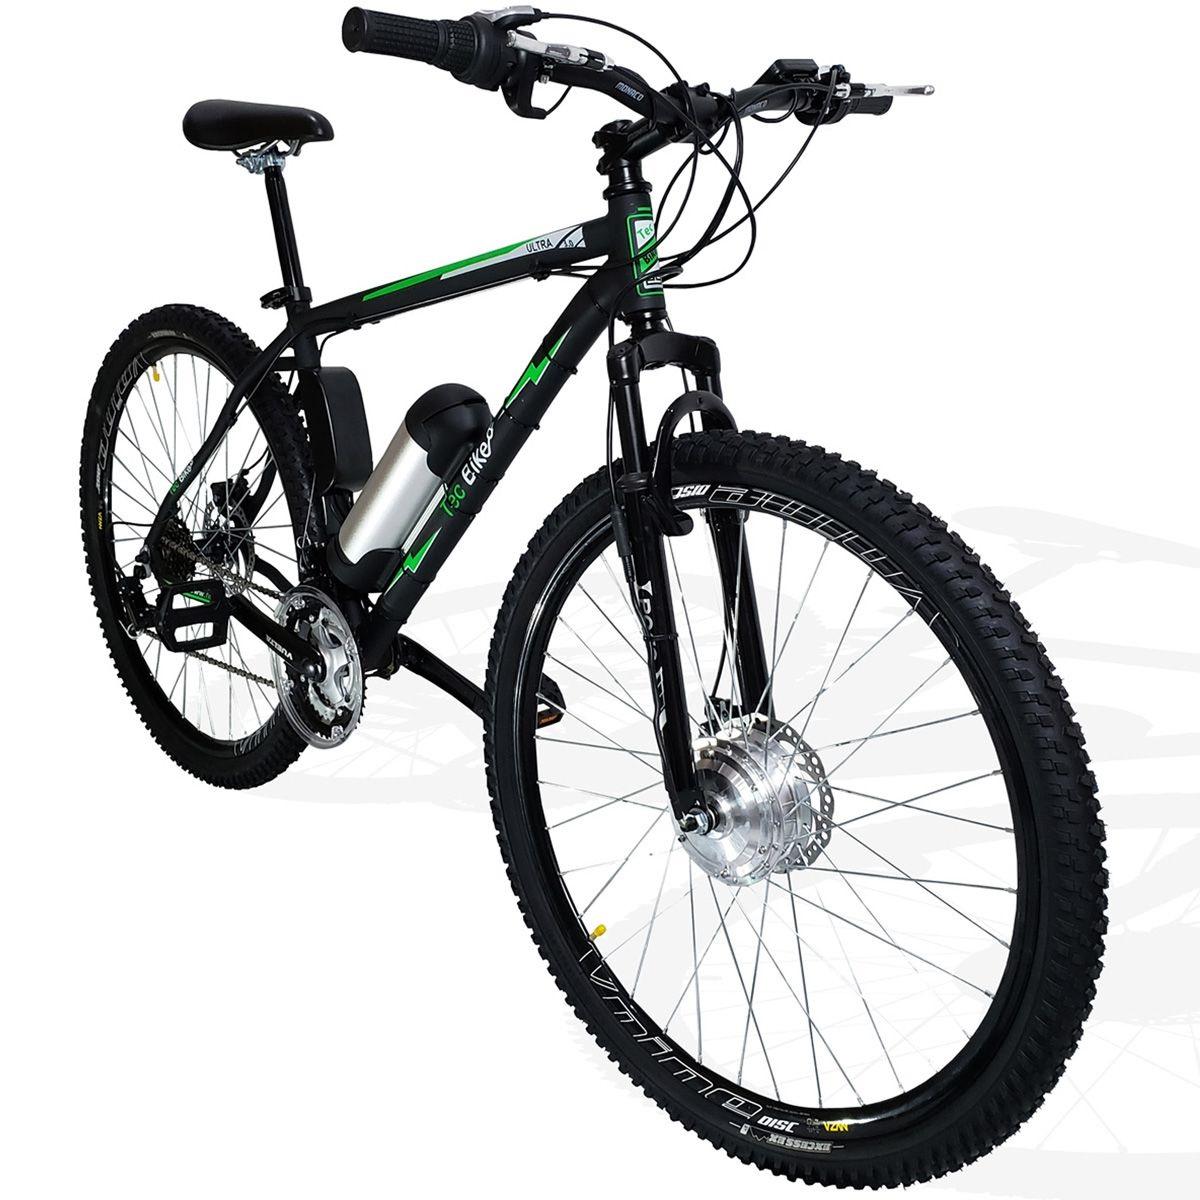 Bicicleta Elétrica Aro 29 Bateria Lítio TecUltra 3.0  -Freio Hidráulico